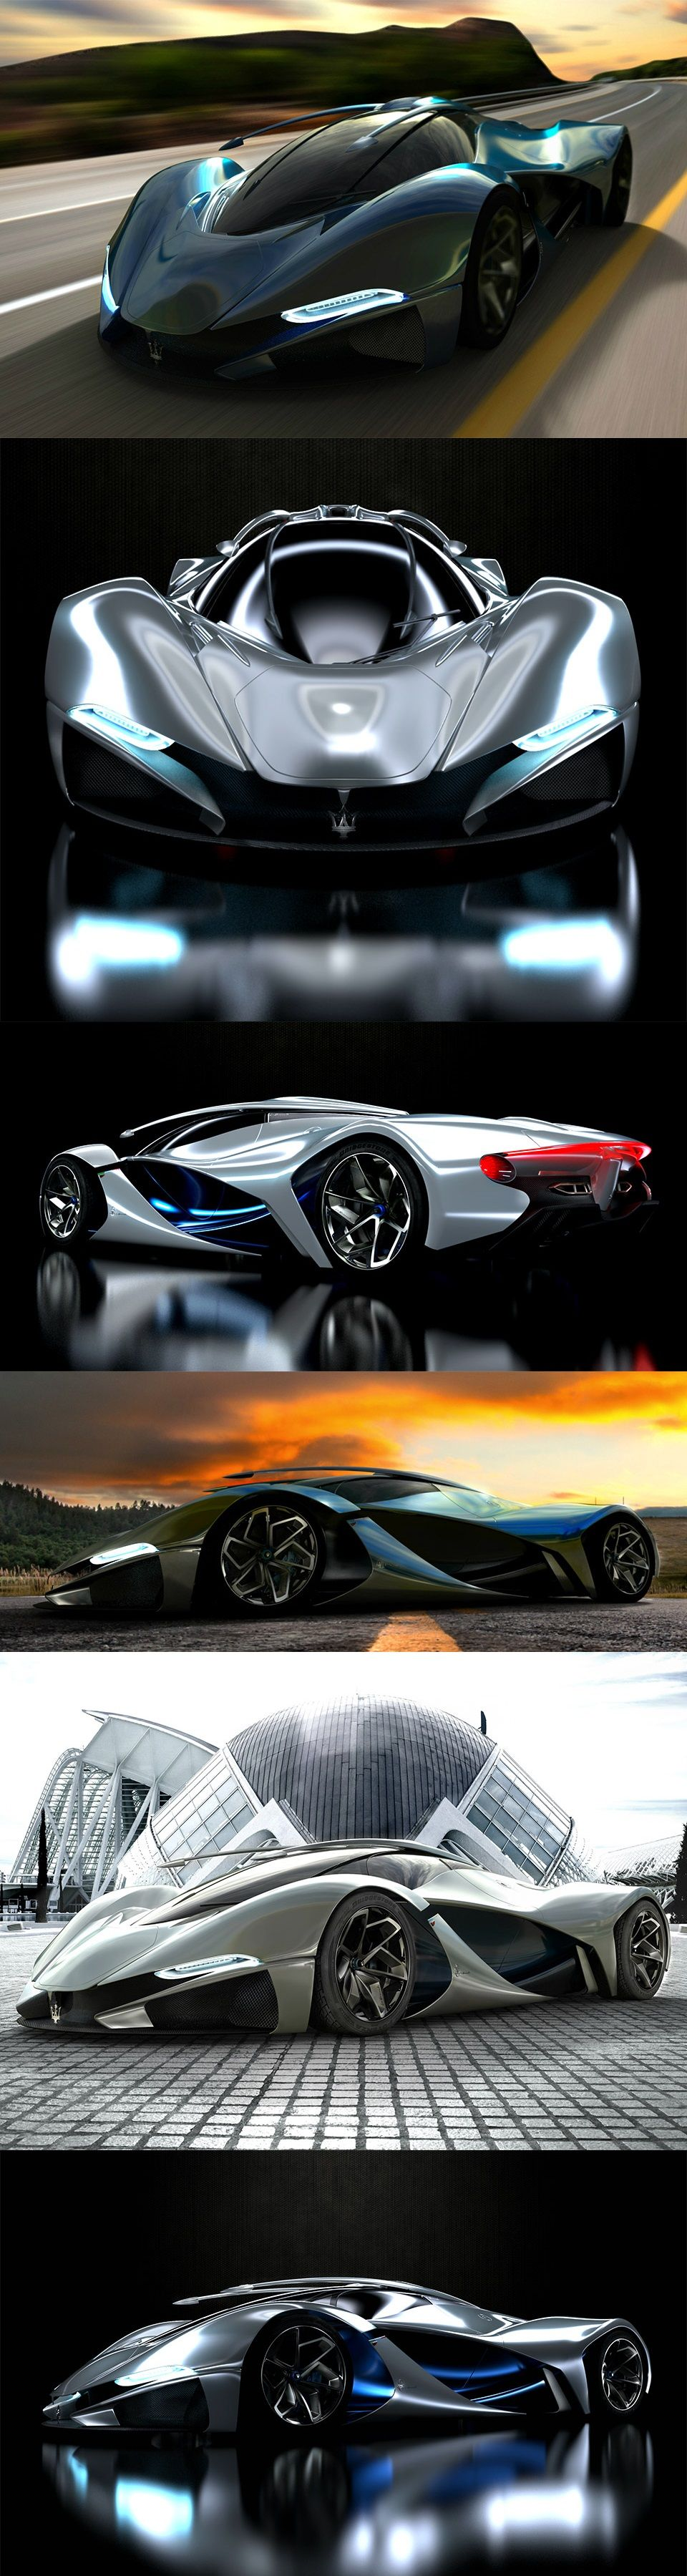 LaMaserati - Concept Car by Mark Hostler